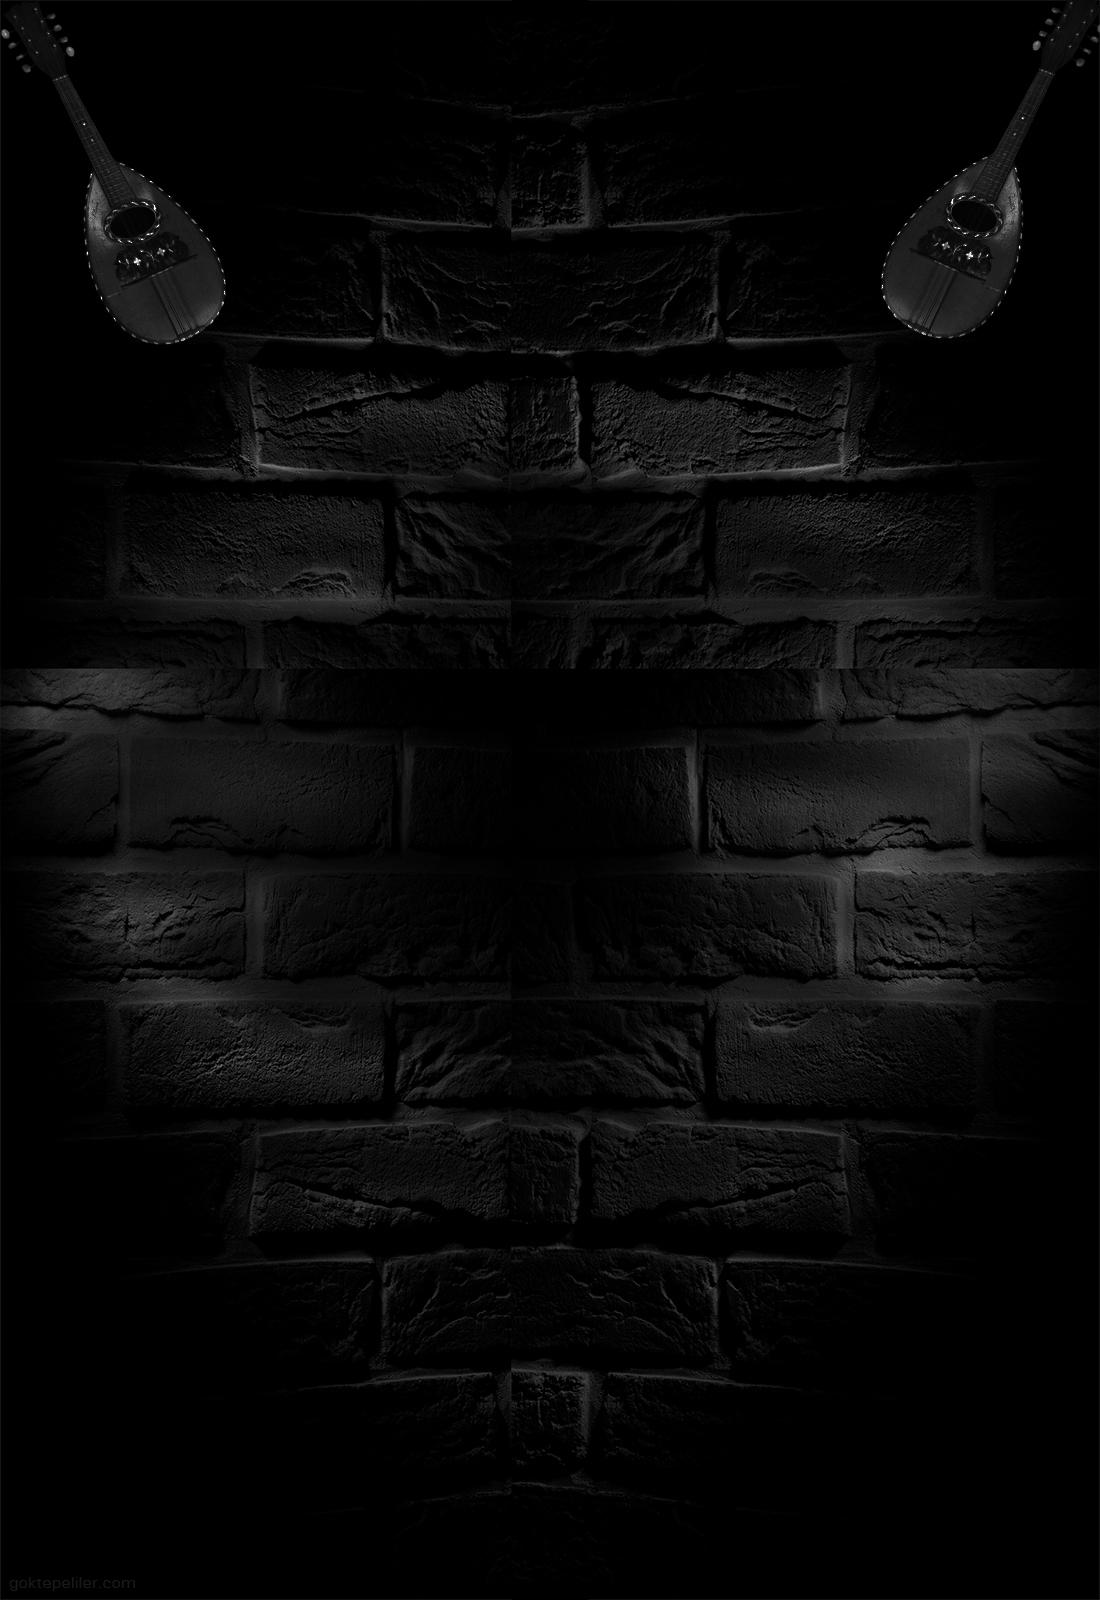 flatcast radyo  u0130ndeks arkaplan fon resimleri 01  siyah